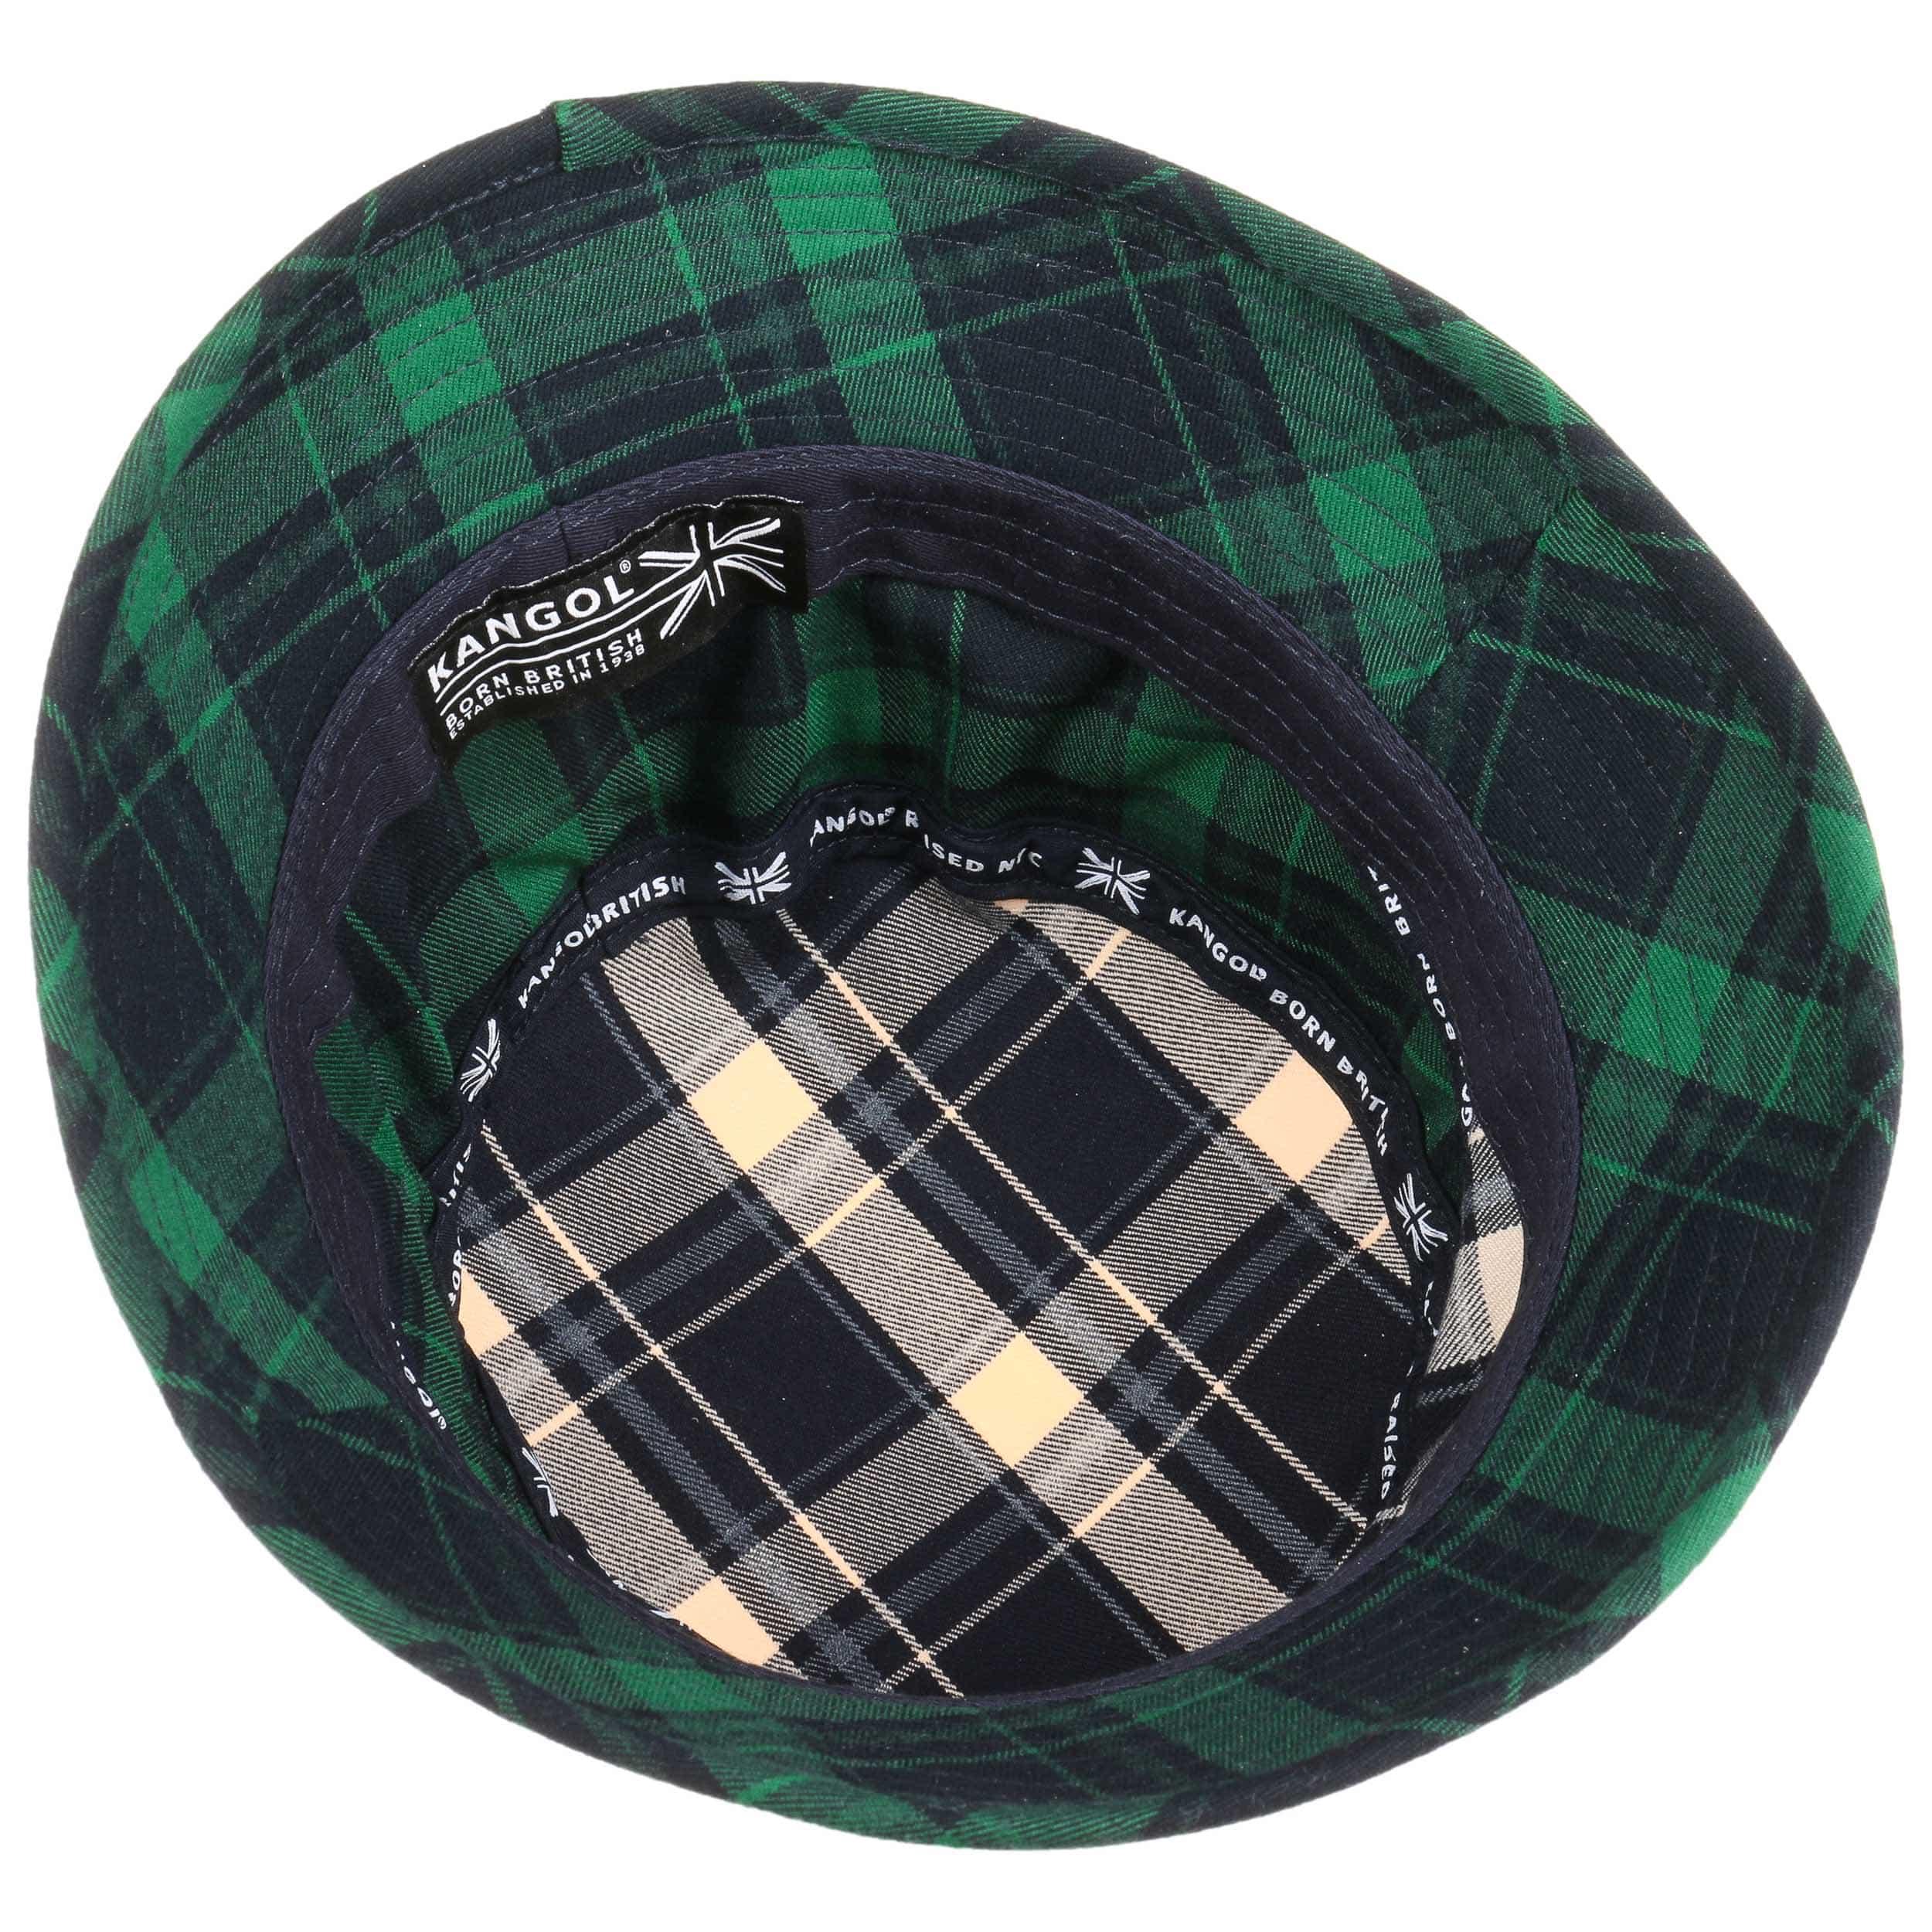 41e6e920a329a0 ... Plaid on Plaid Bucket Hat by Kangol - blue-green 2 ...